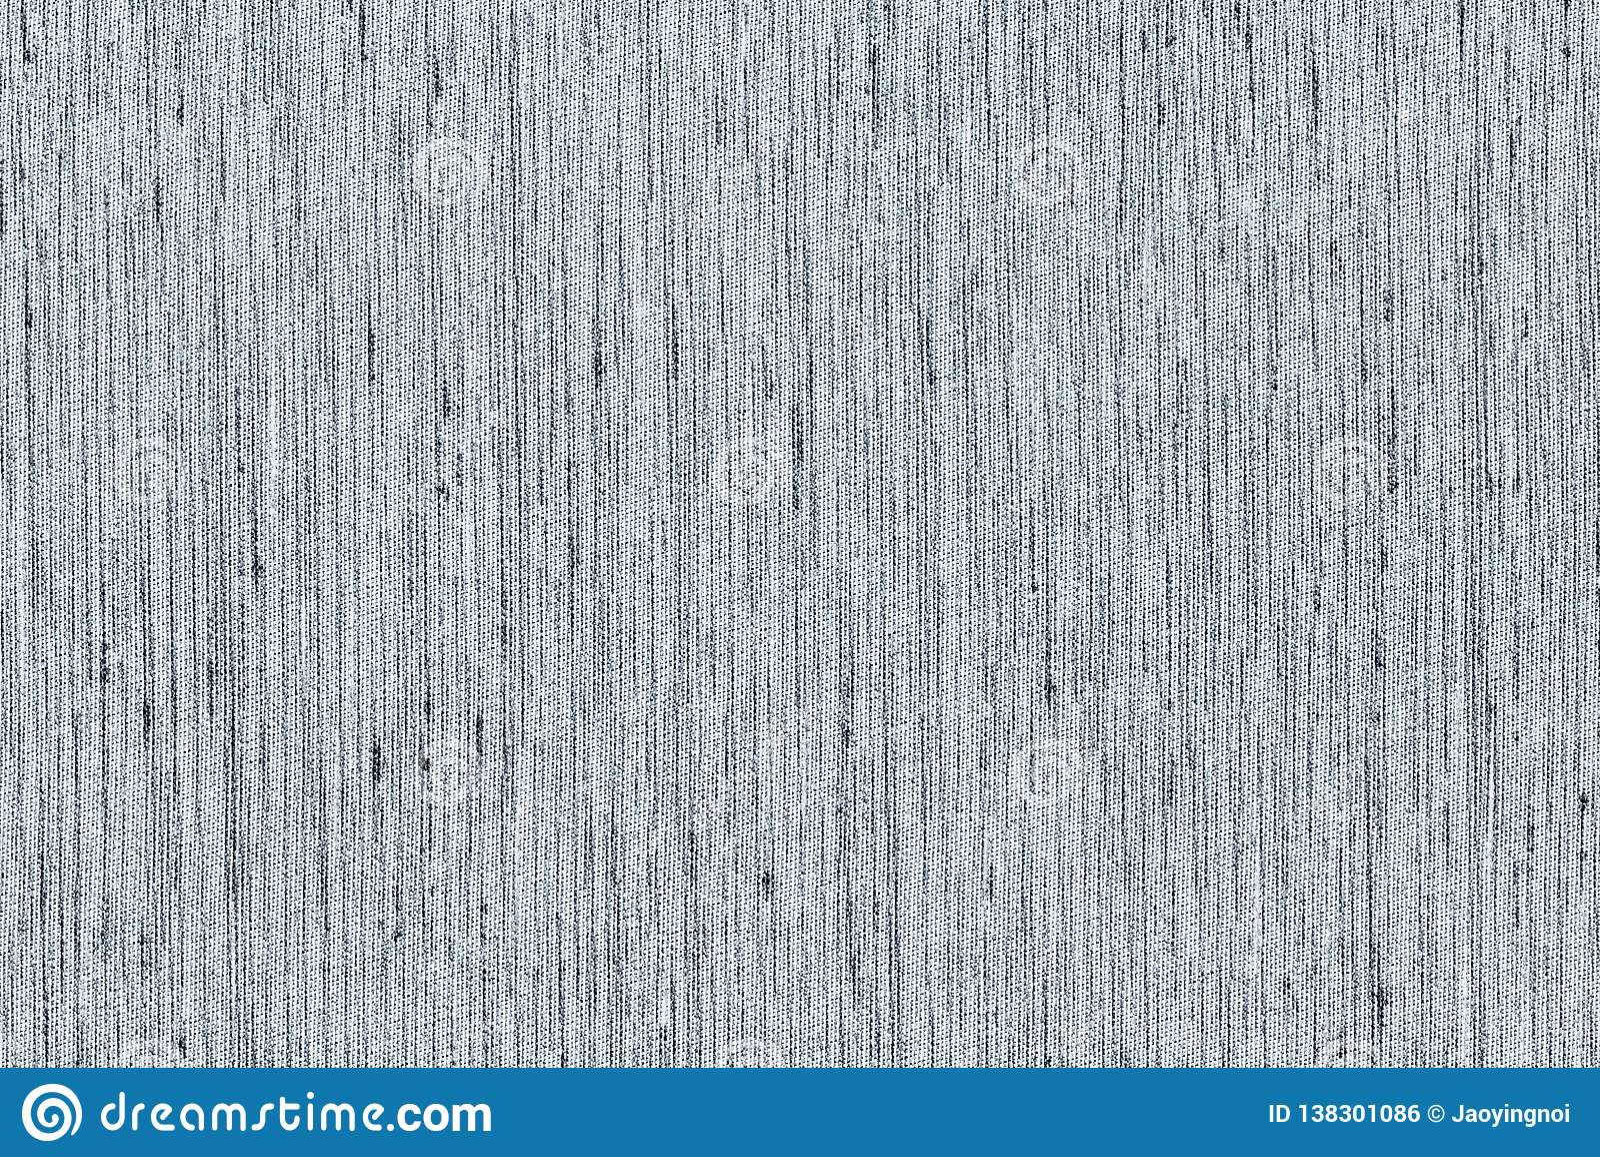 Close up preto e branco ou claro - contexto cinzento da textura da amostra da tela das cores Claro - linha de tira cinzenta proje